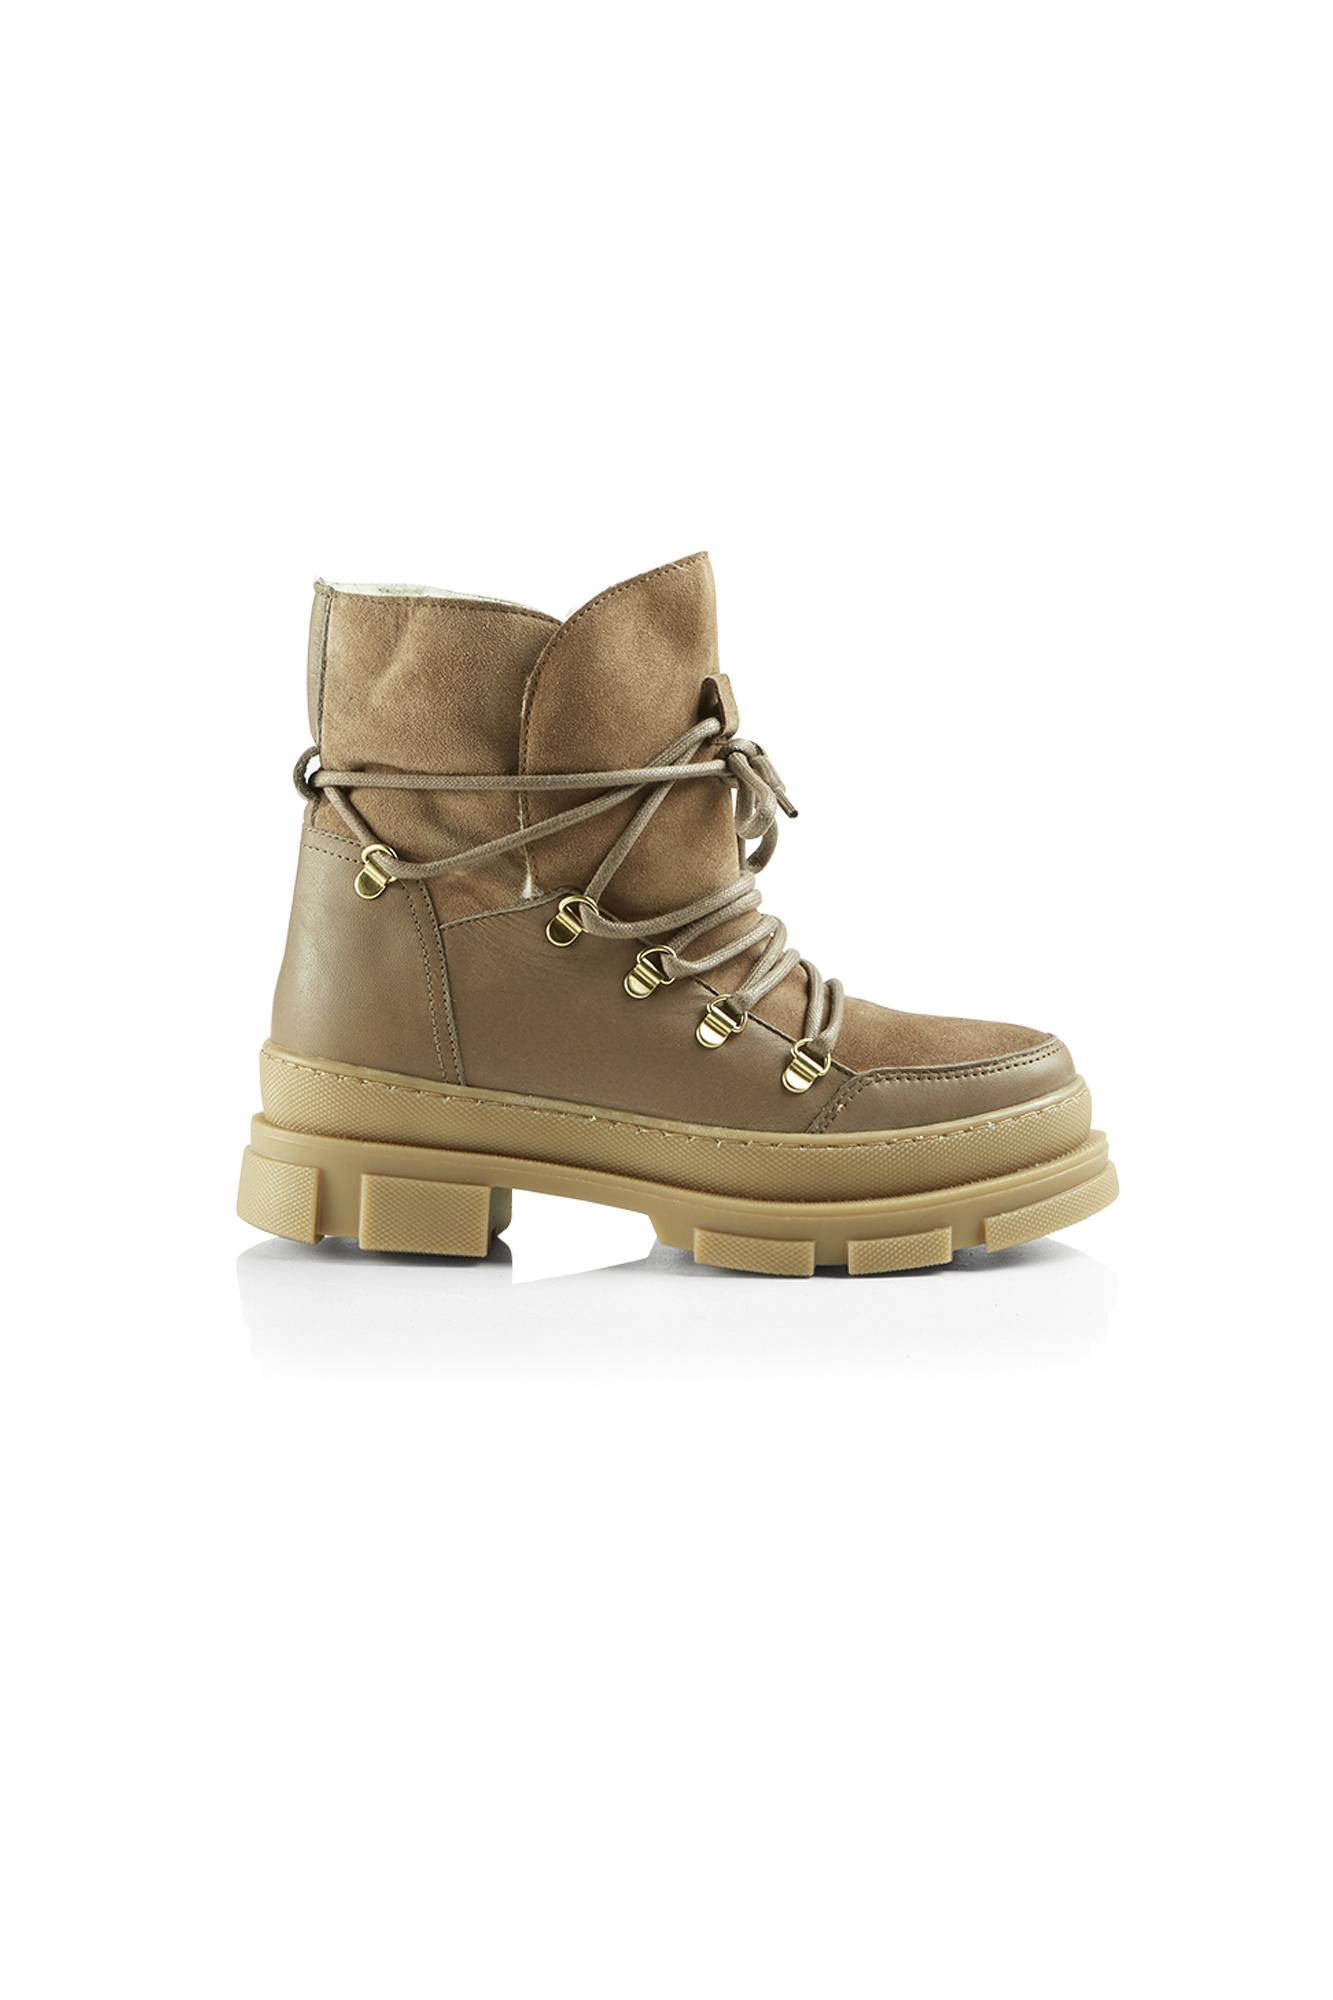 Kiara Wool Suede Boot - Khaki-1